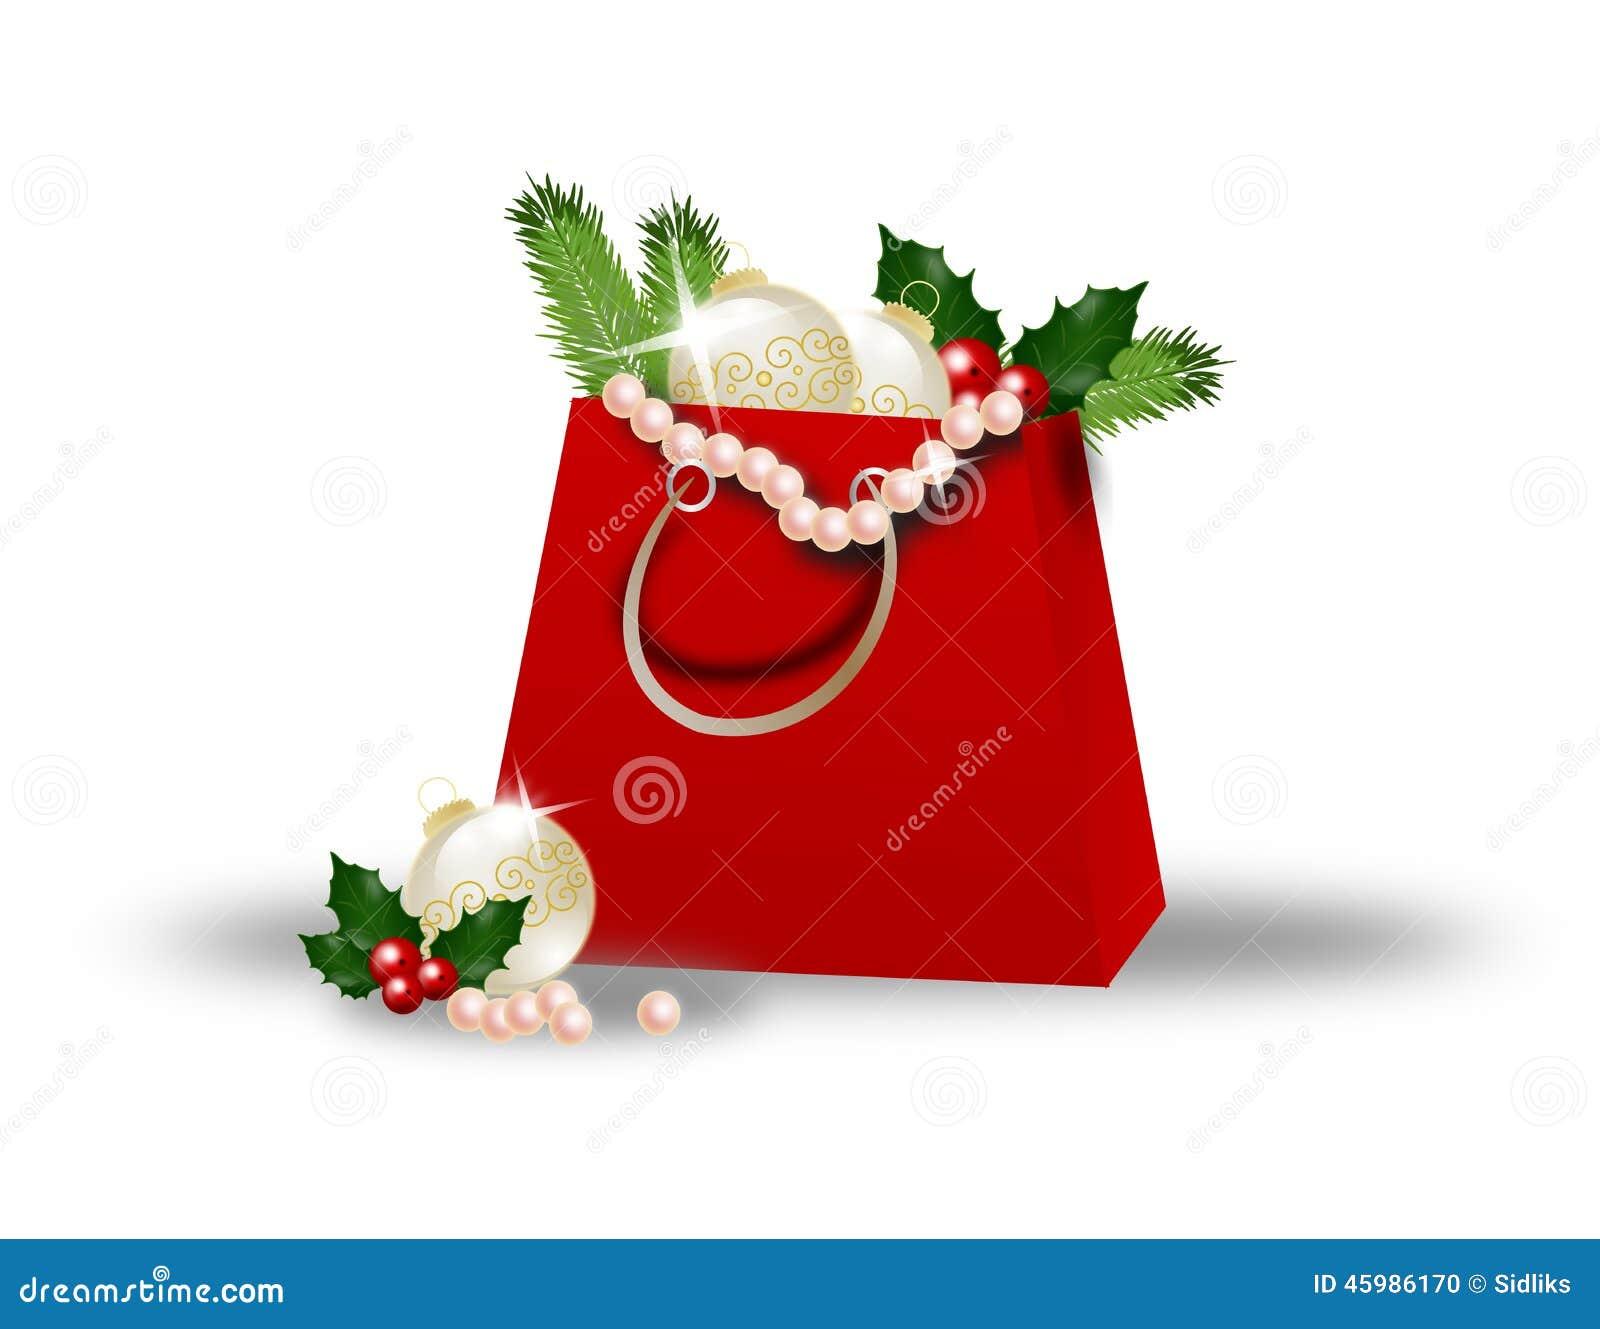 Christmas shopping bag stock illustration image 45986170 for Christmas decorations online shopping